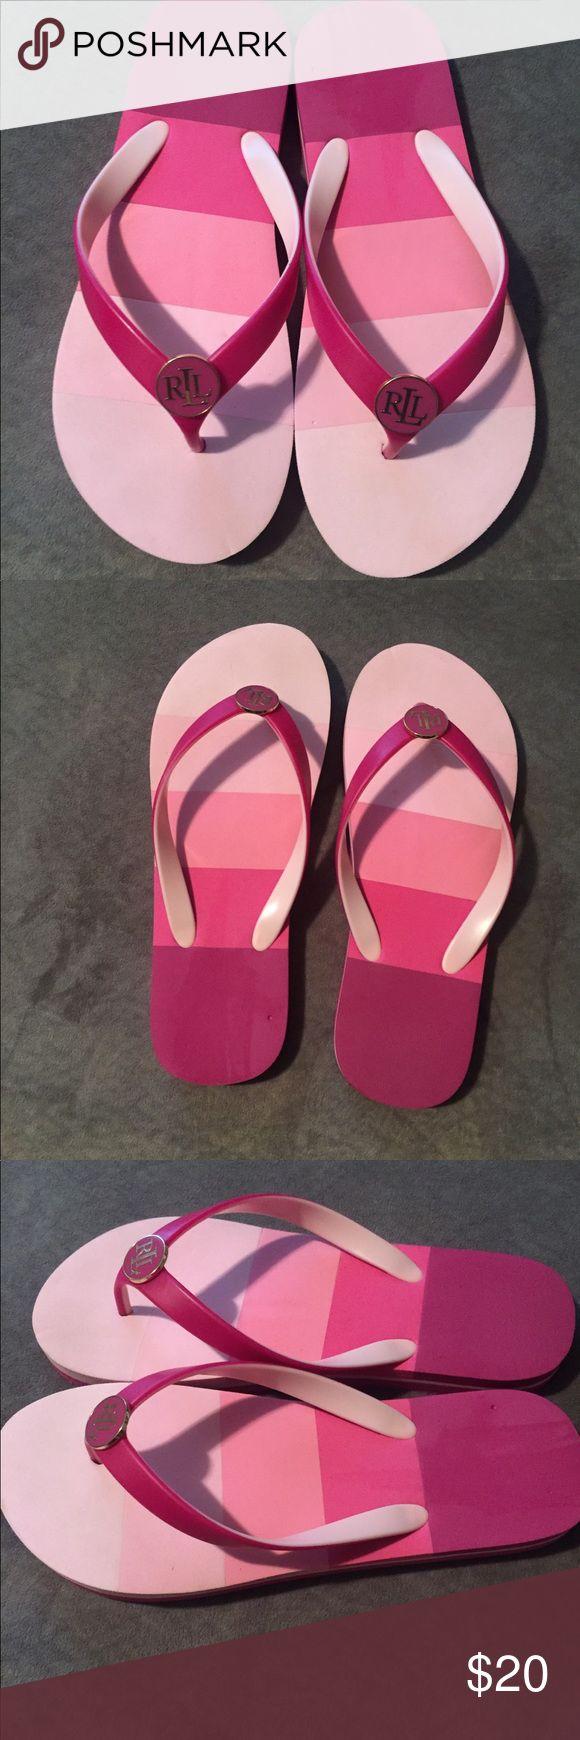 Ralph Lauren women Flip flops. Ralph Lauren ladies flip flop. Size 7-8. Only tried on in the house. Excellent condition.Fushia,pink , and white . Ralph Lauren Shoes Sandals